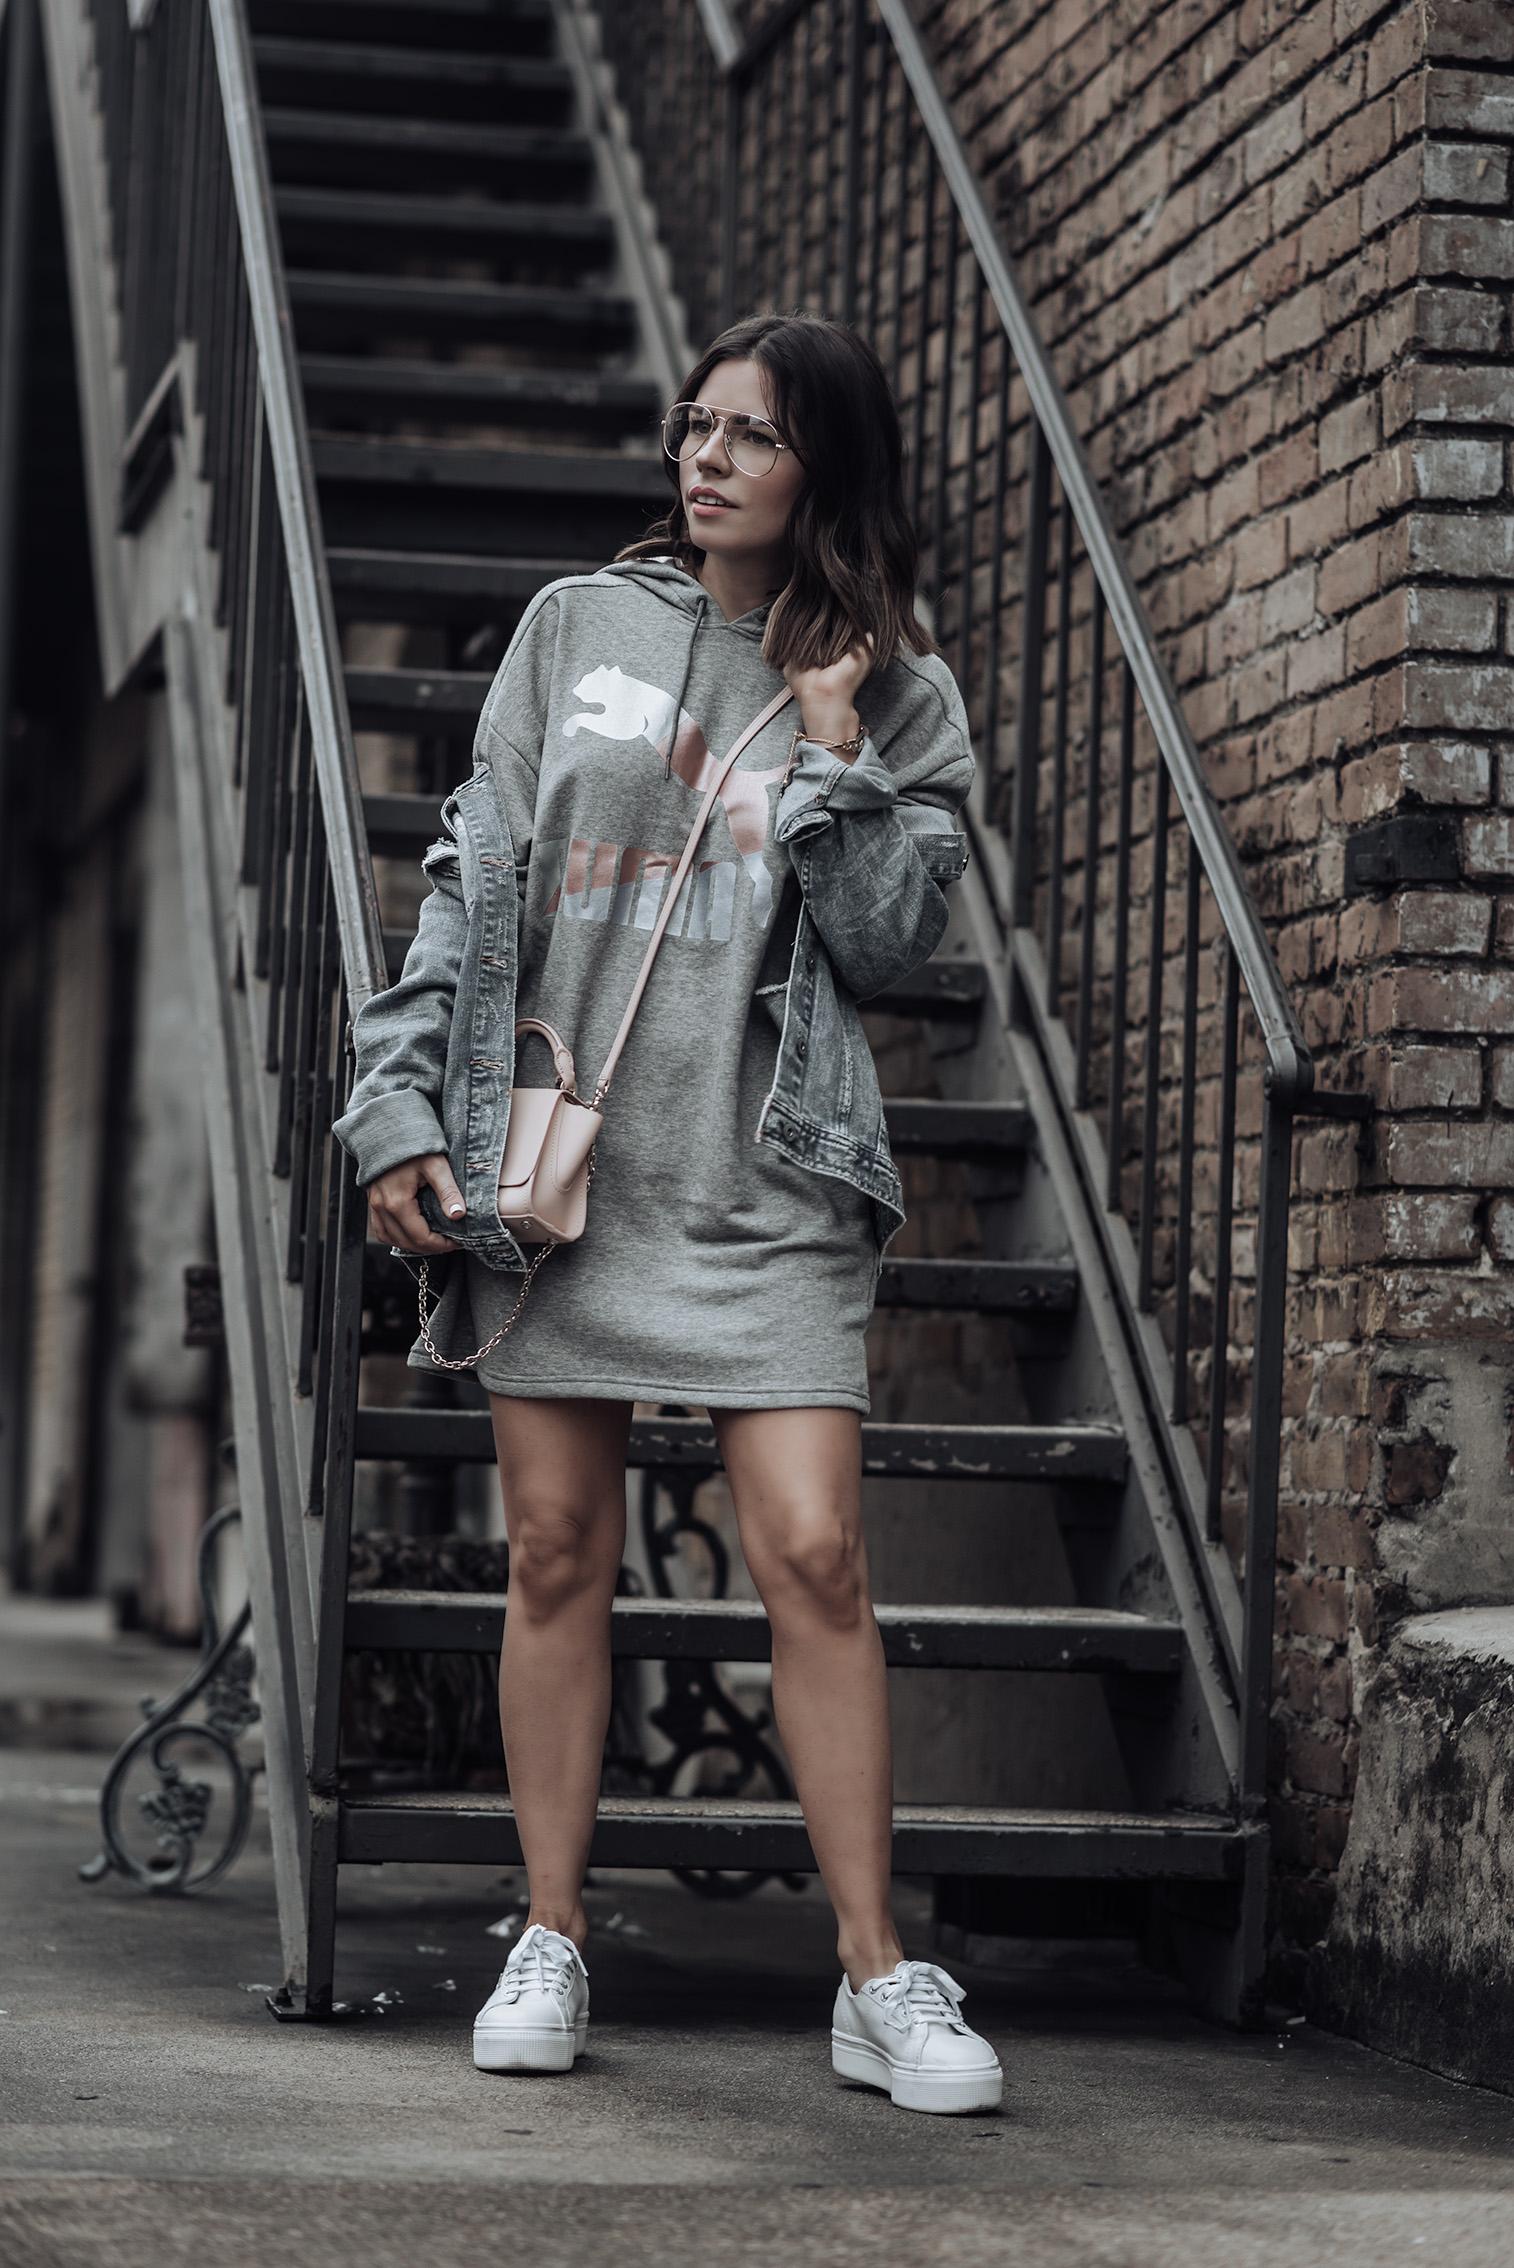 Athleisure wear |Puma Sweatshirt dress | Denim jacket #streetstyle #puma #liketkit